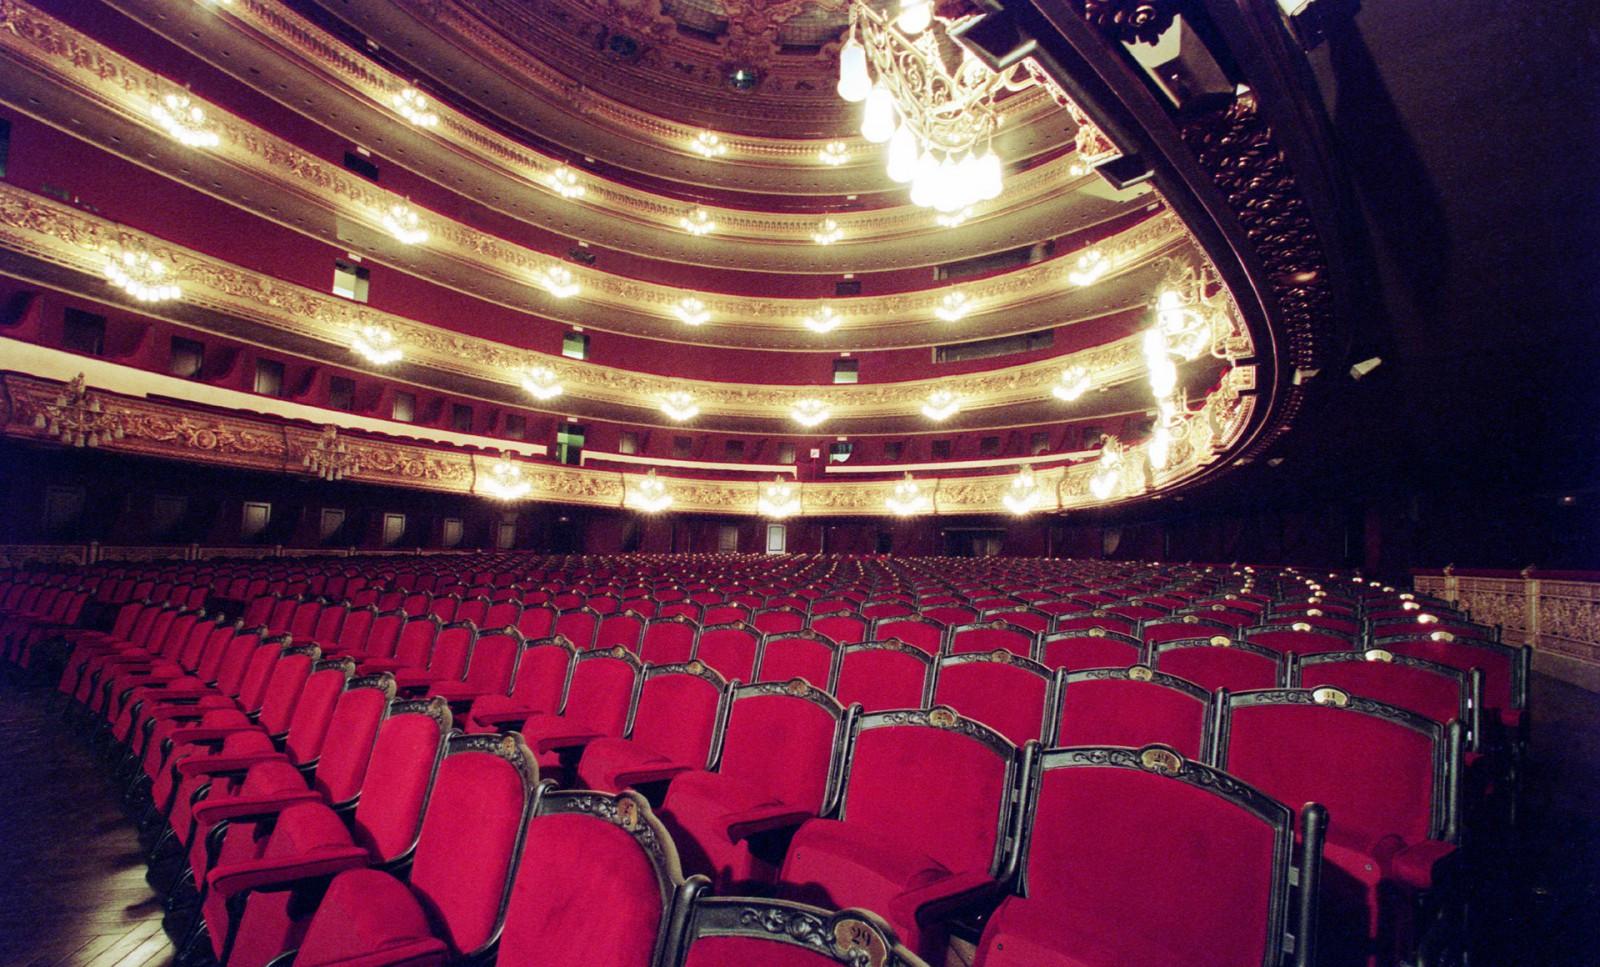 Grand Teatre del Liceu in Barcelona